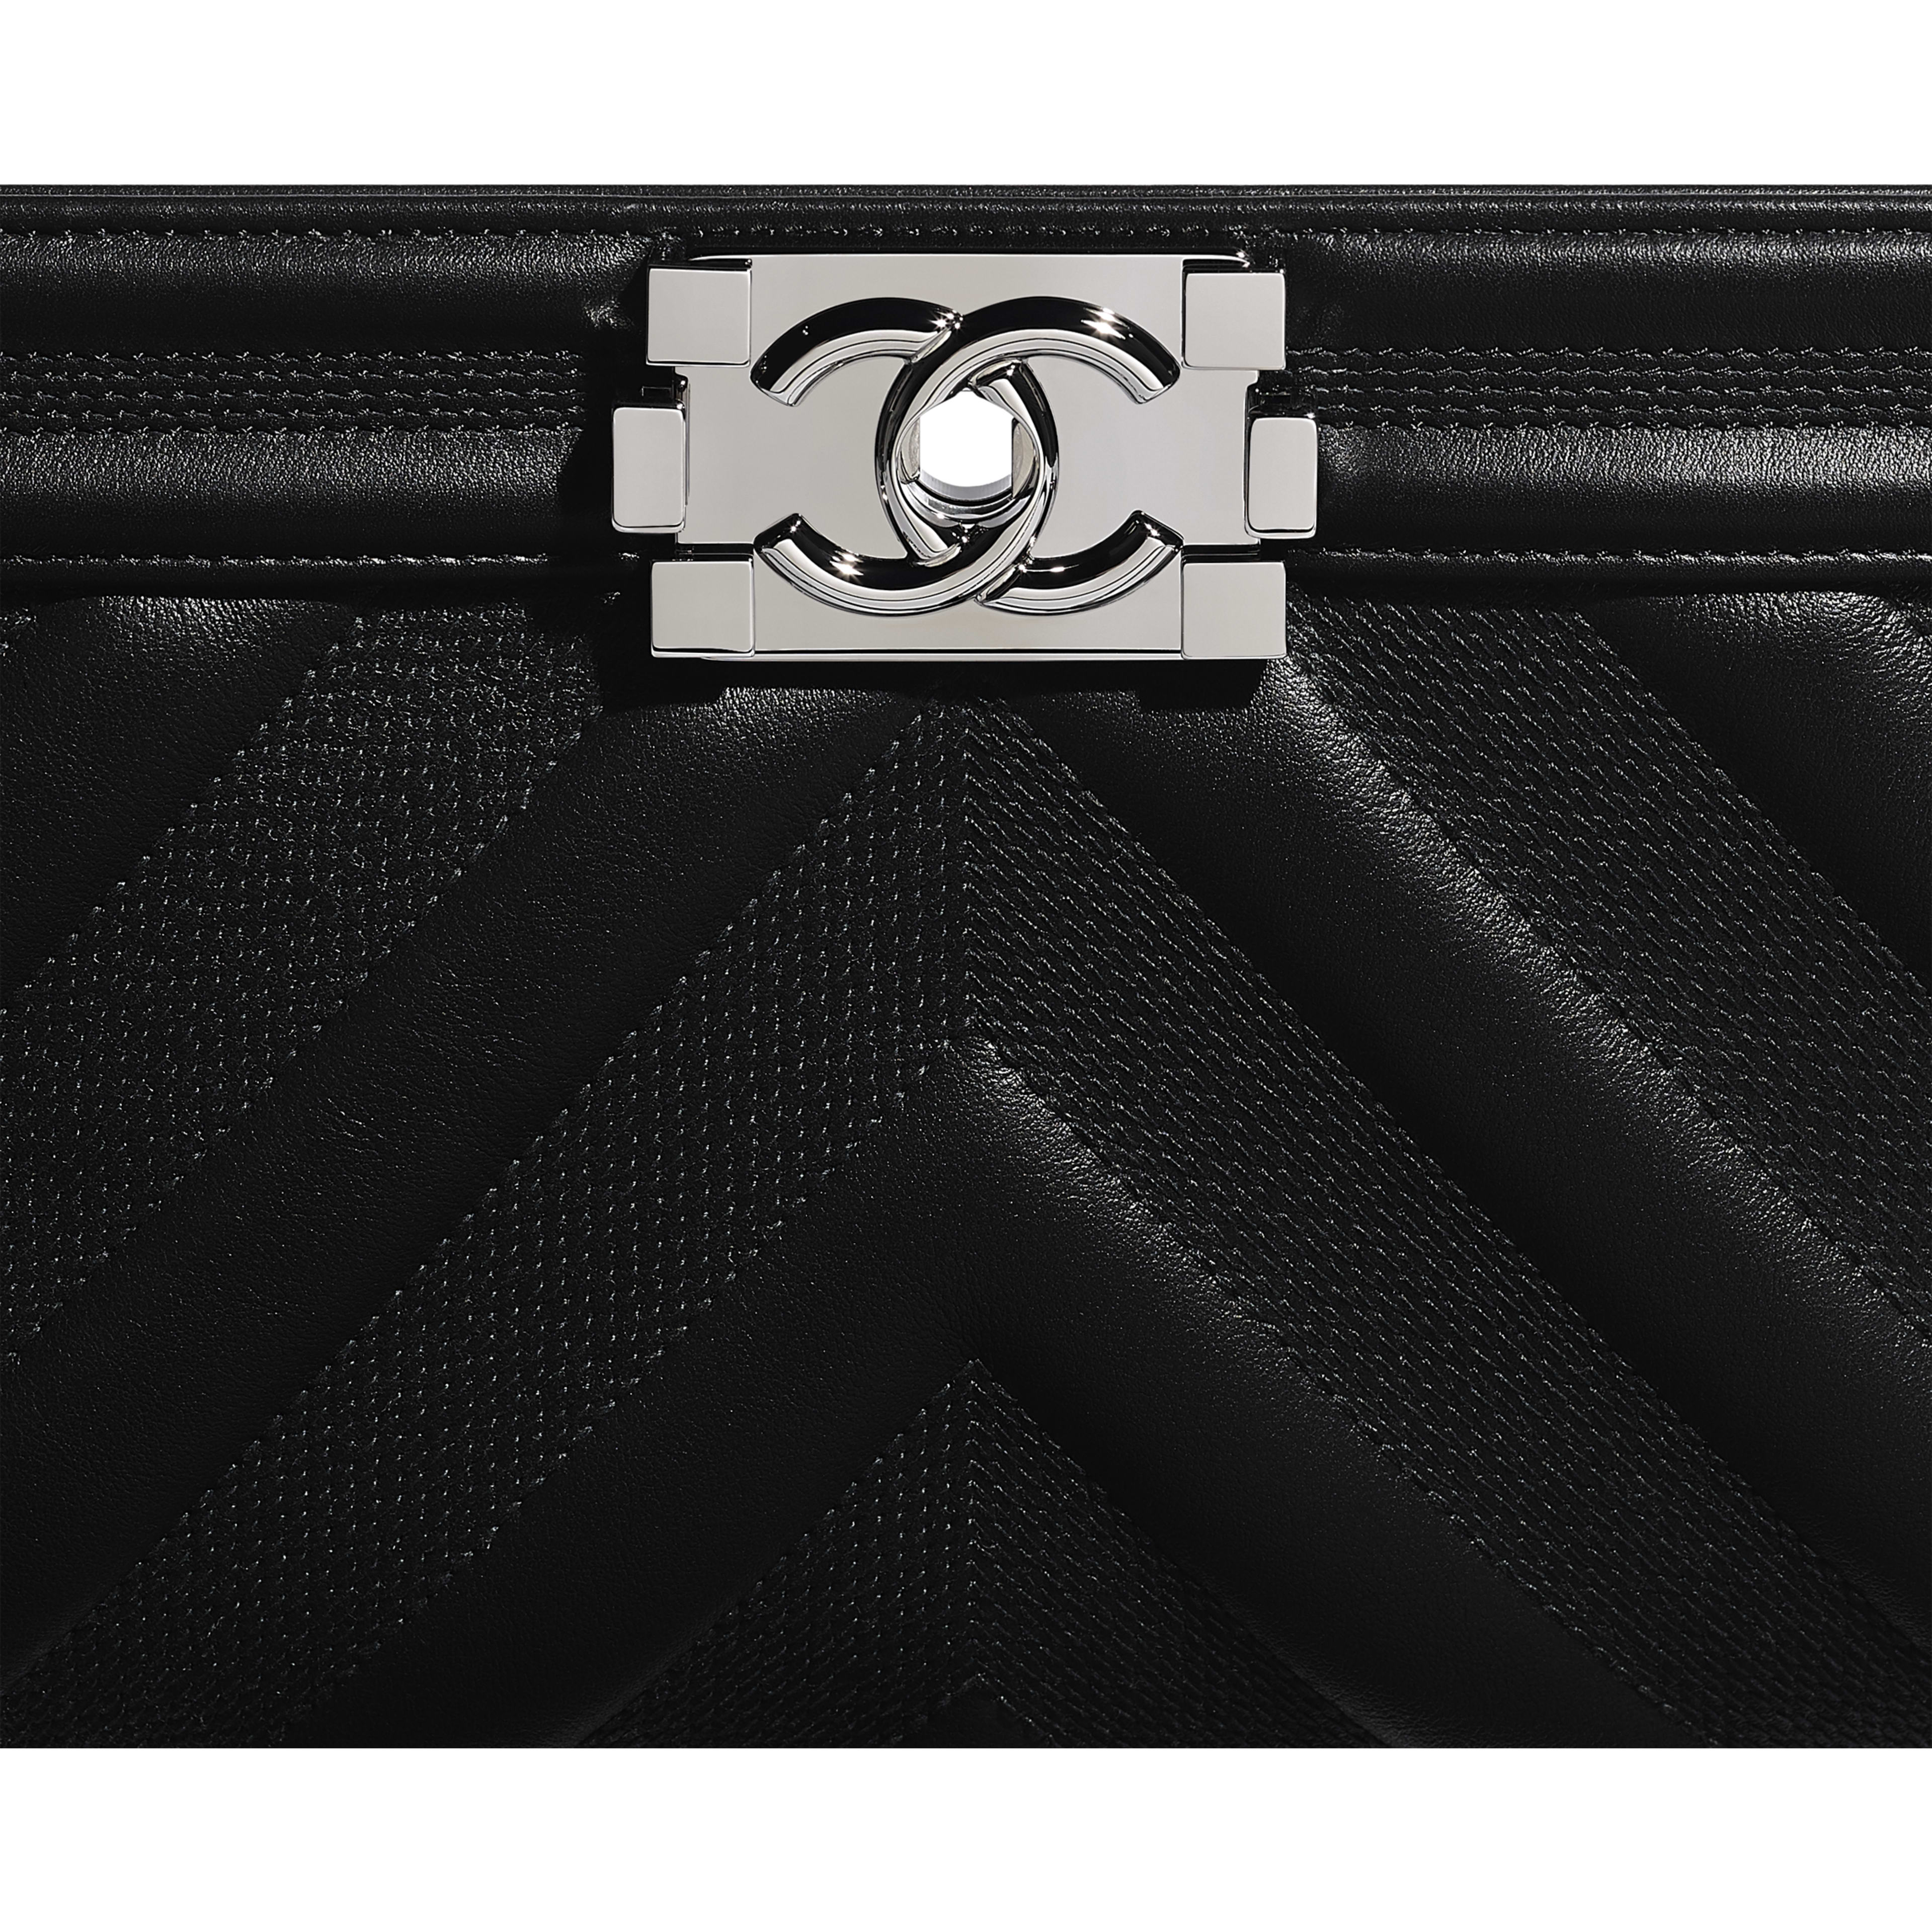 BOY CHANEL Handbag - Black - Calfskin & Ruthenium-Finish Metal - Extra view - see full sized version